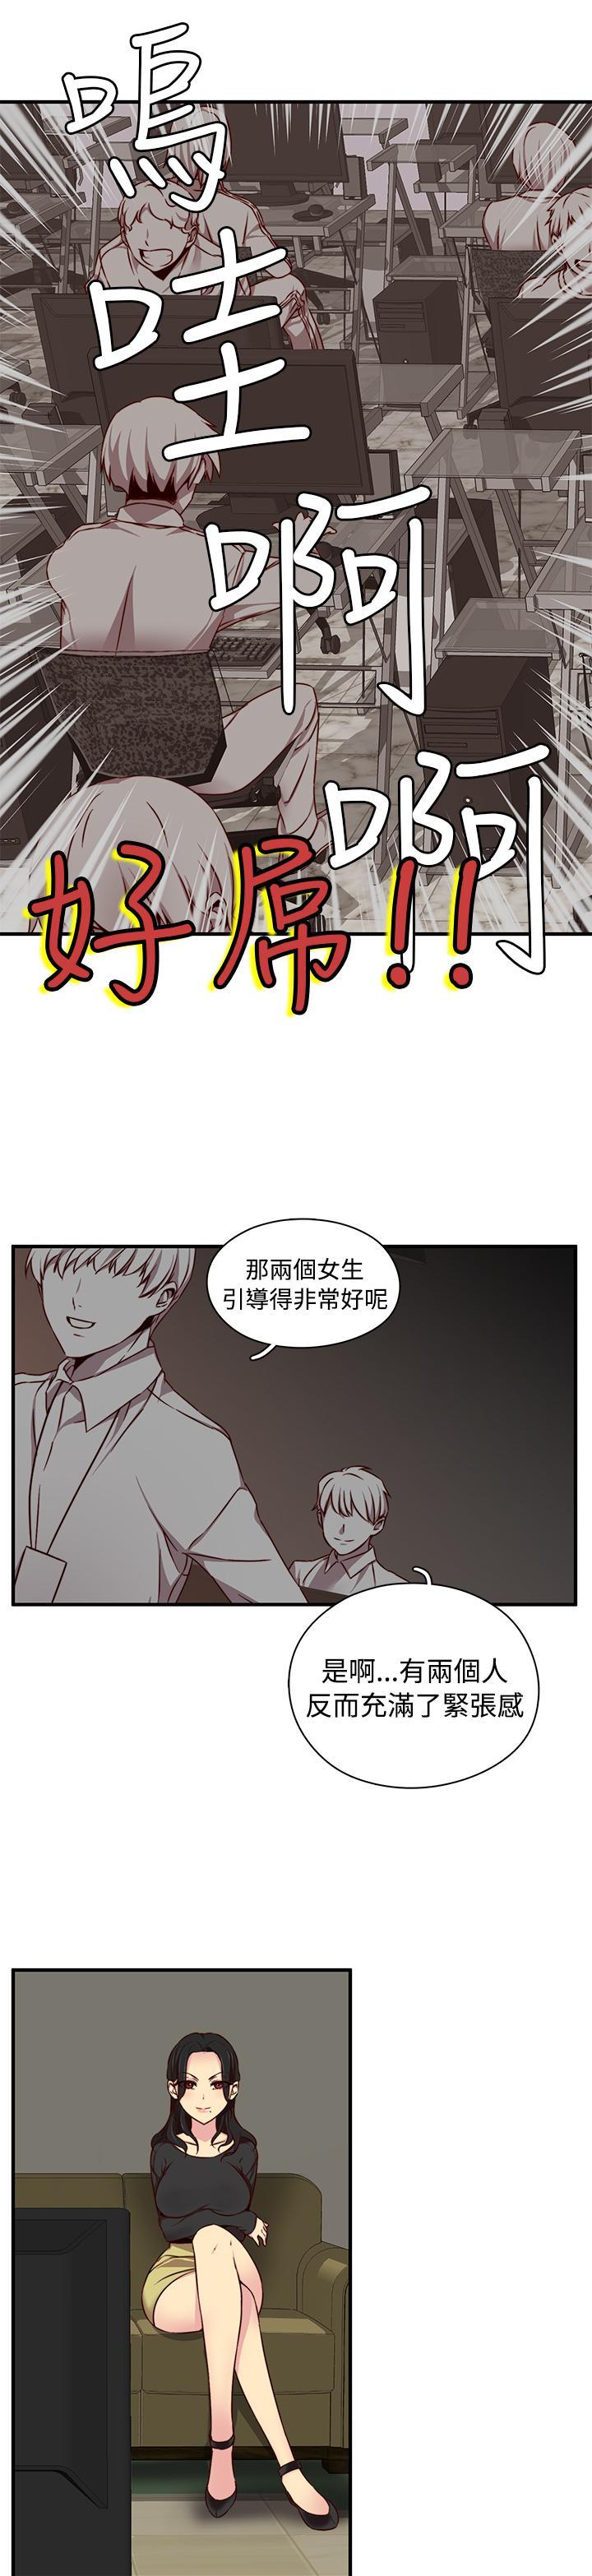 [Dasum & Puutaro] H-Campus H校园<第2季> ch.41-46 (chinese) 18